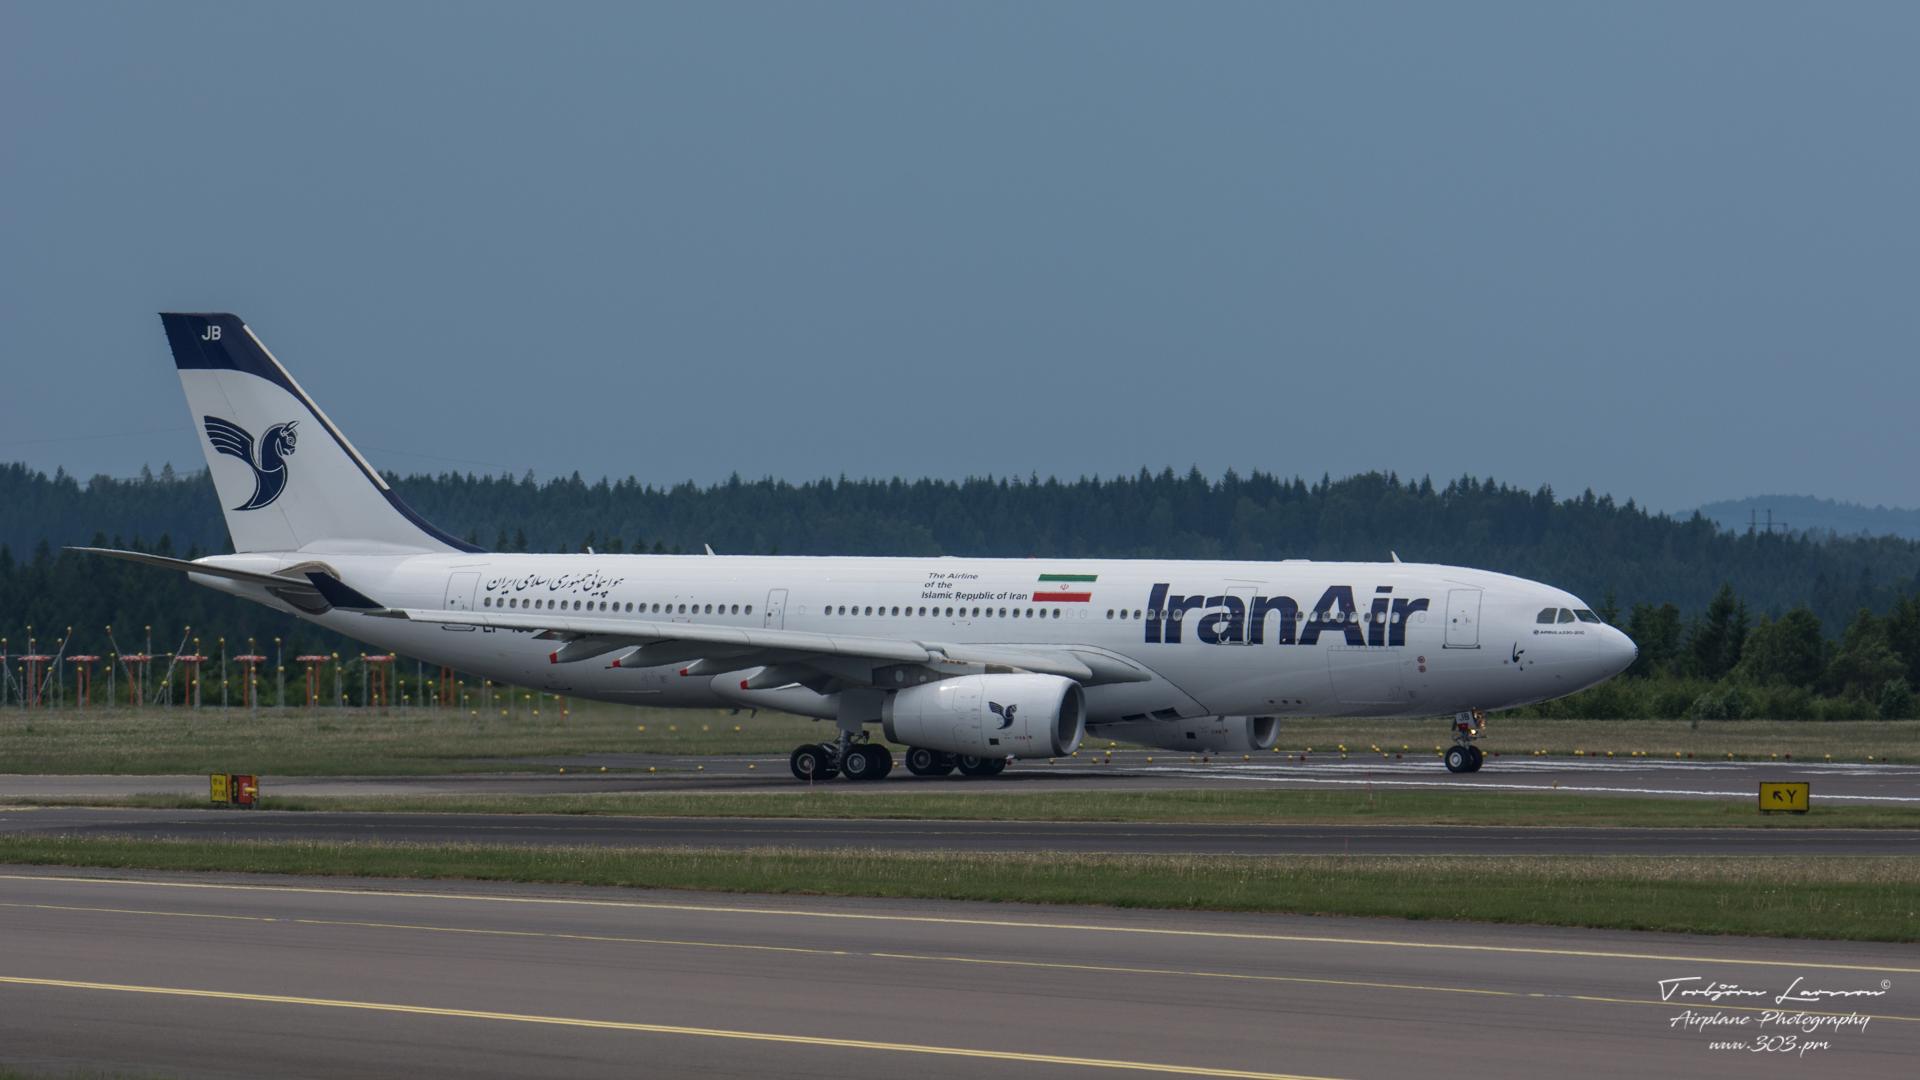 TBE_8608-Airbus A330-243 - Iran Air - (EP-IJB)